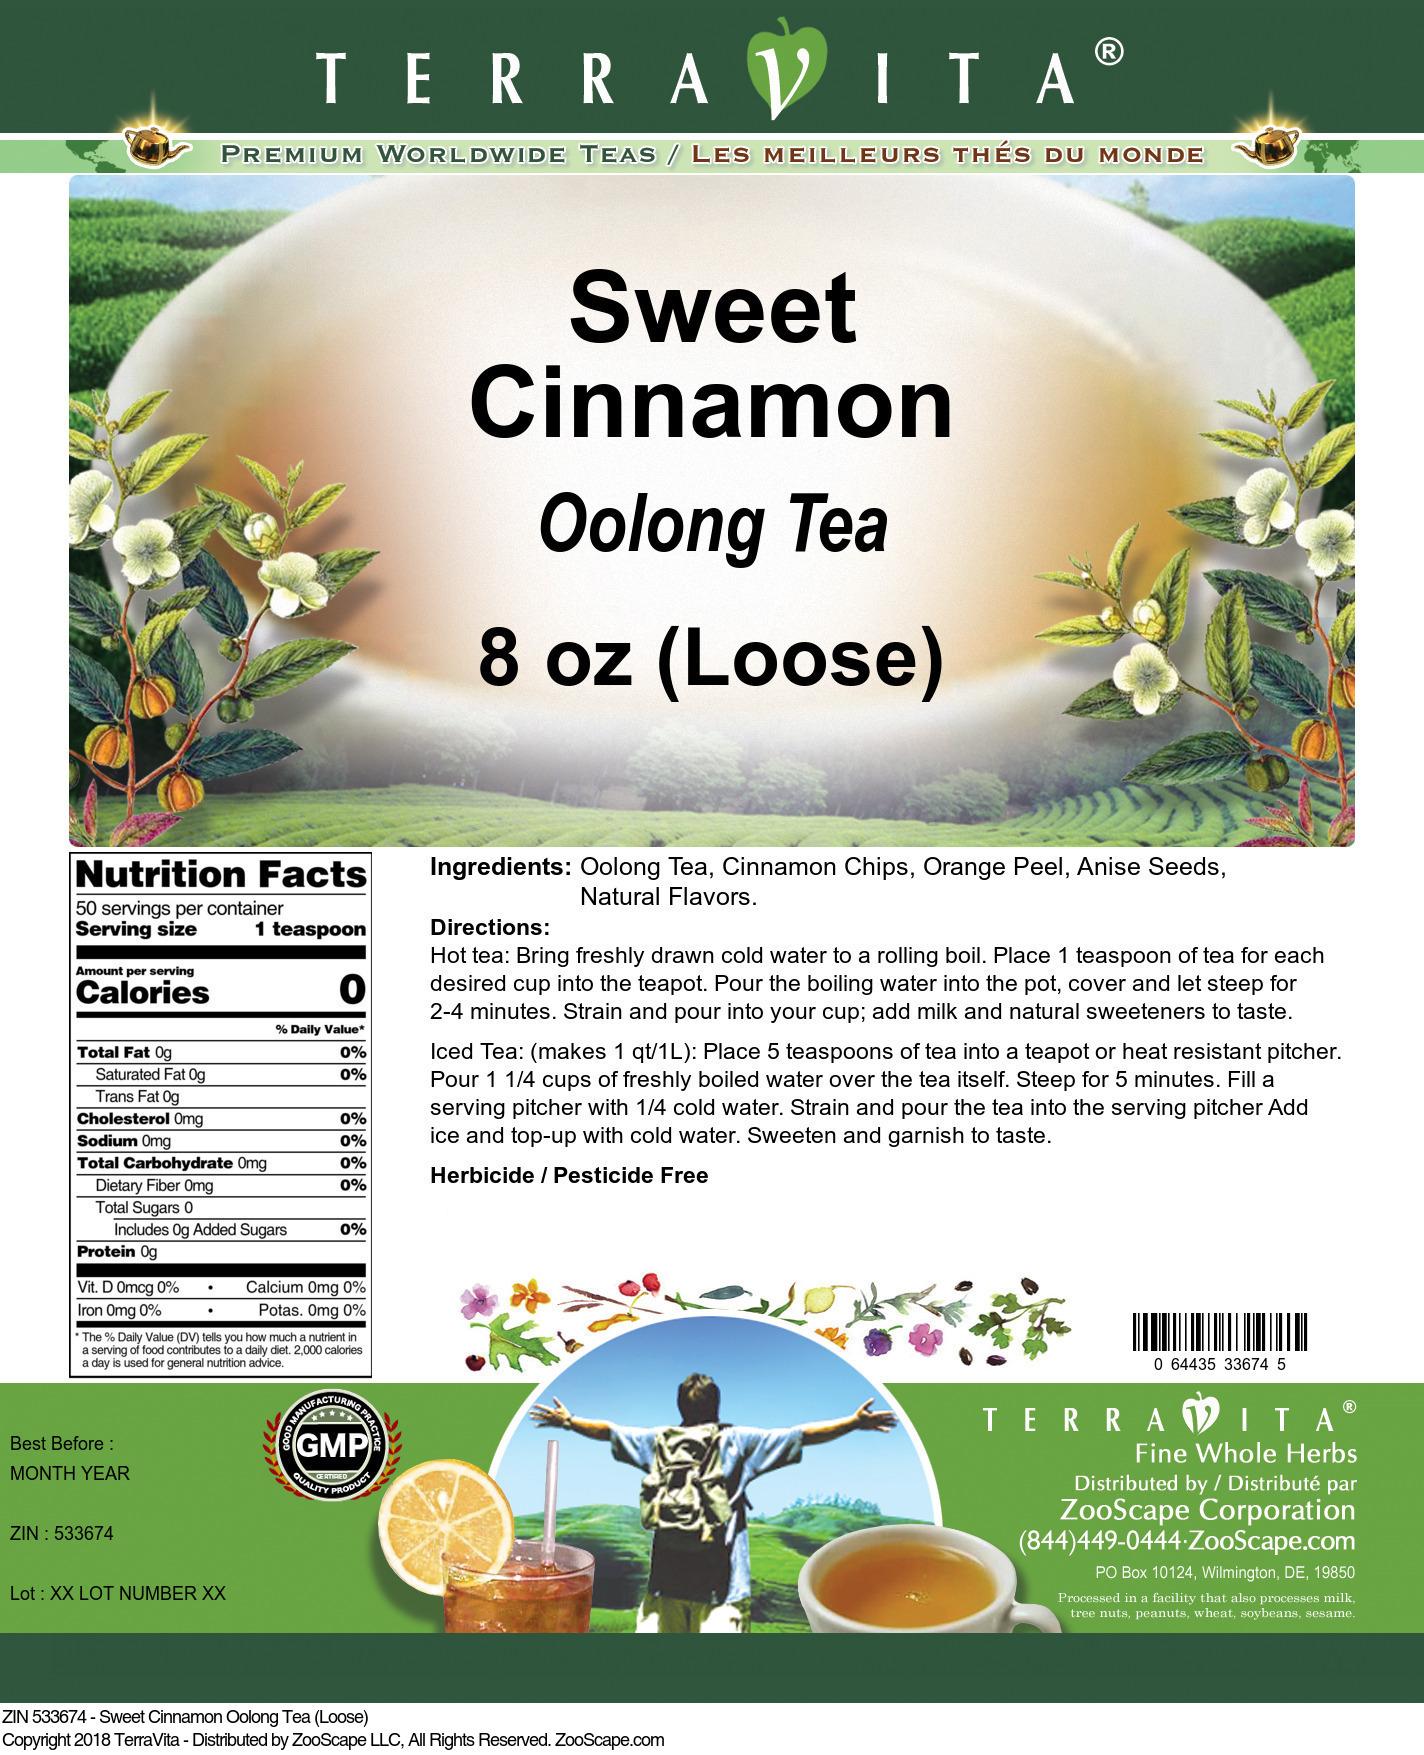 Sweet Cinnamon Oolong Tea (Loose)